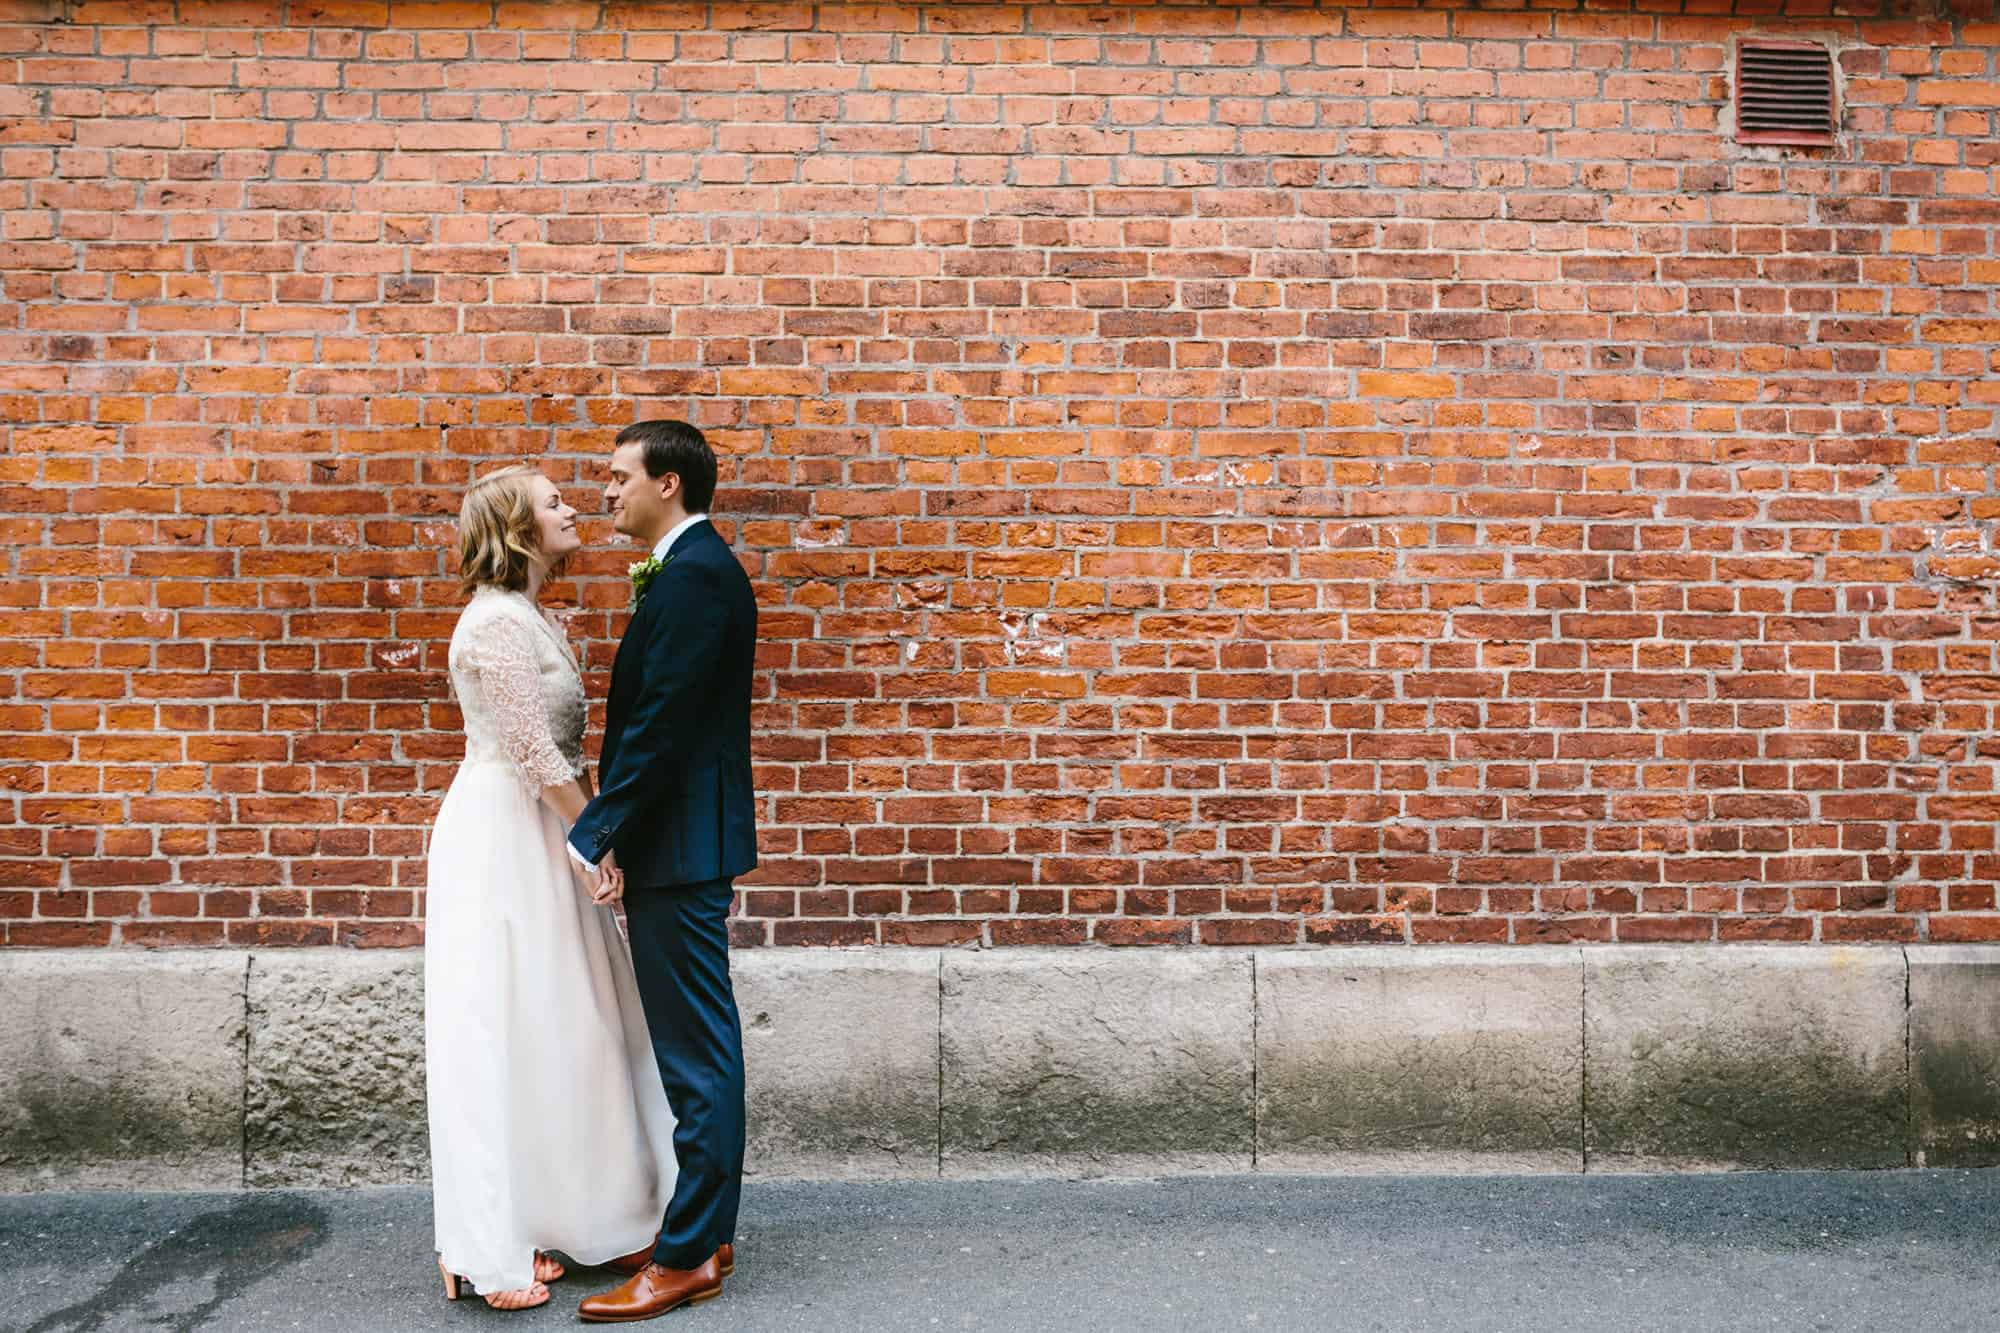 Bröllop, Hovås kallbadhus, bröllopsfoto, Göteborg, Hovås, B